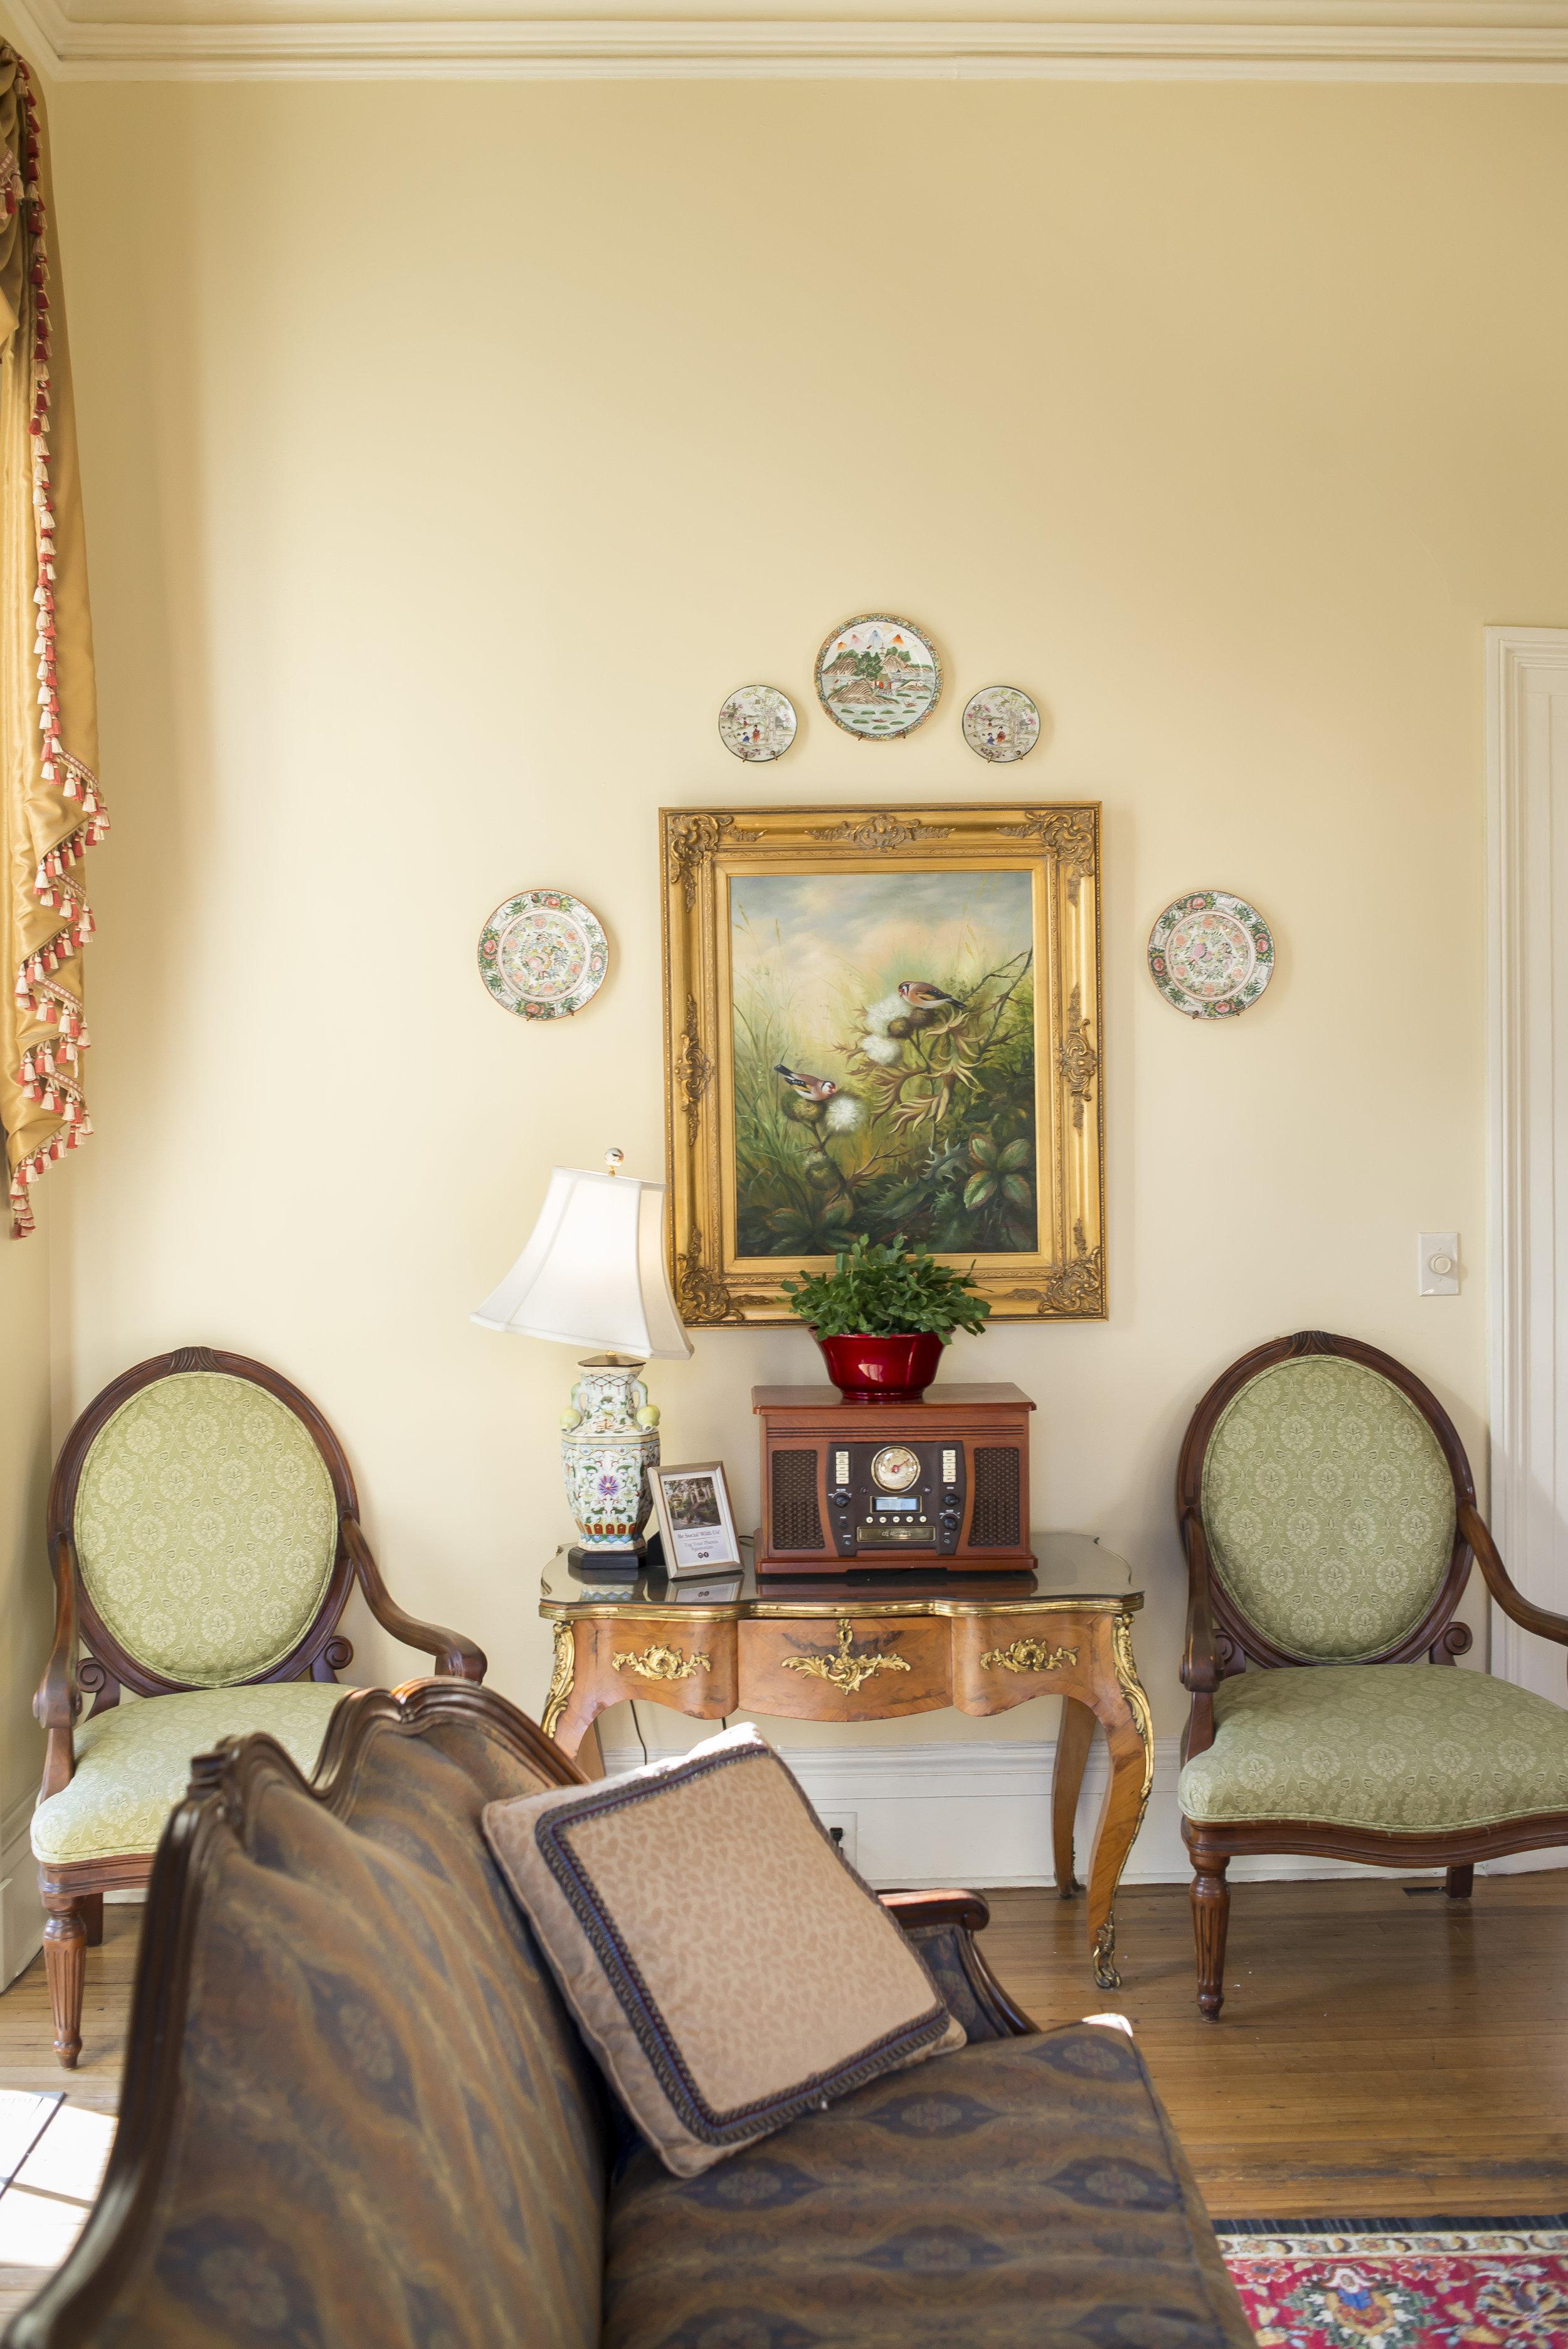 Savannah parlor and portrait setting